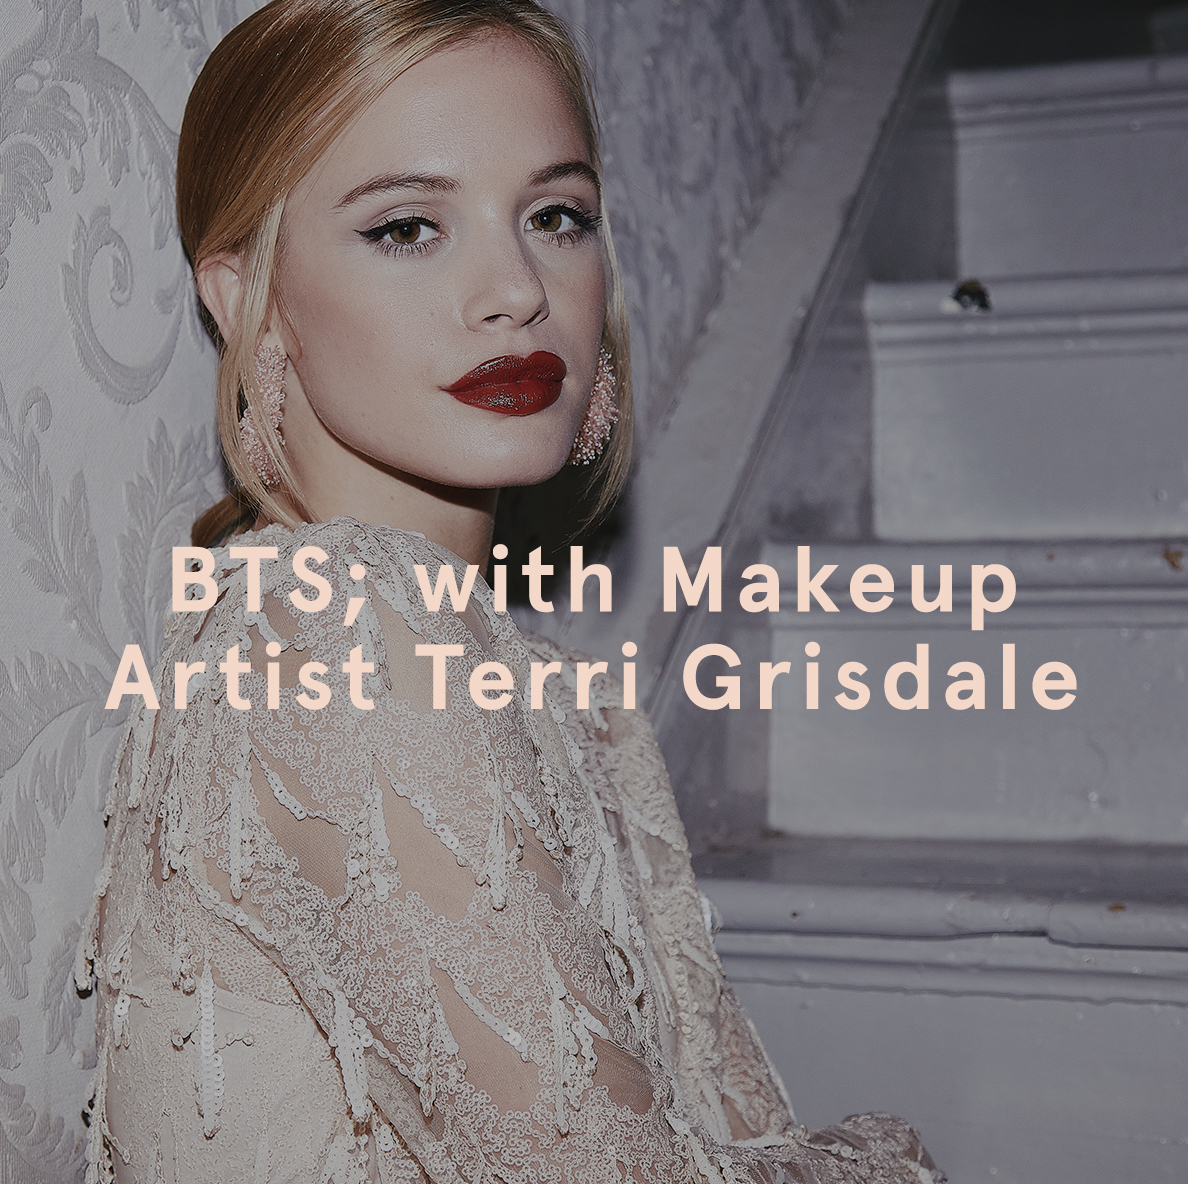 Makeup Artist Terri Grisdale